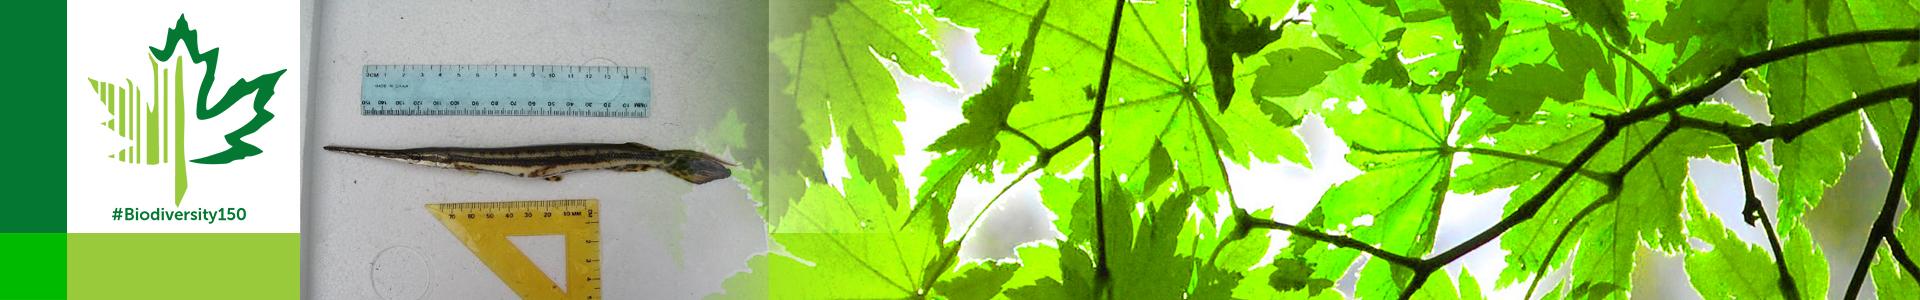 #Biodiversity150 number 139 of 150 Longnose gar